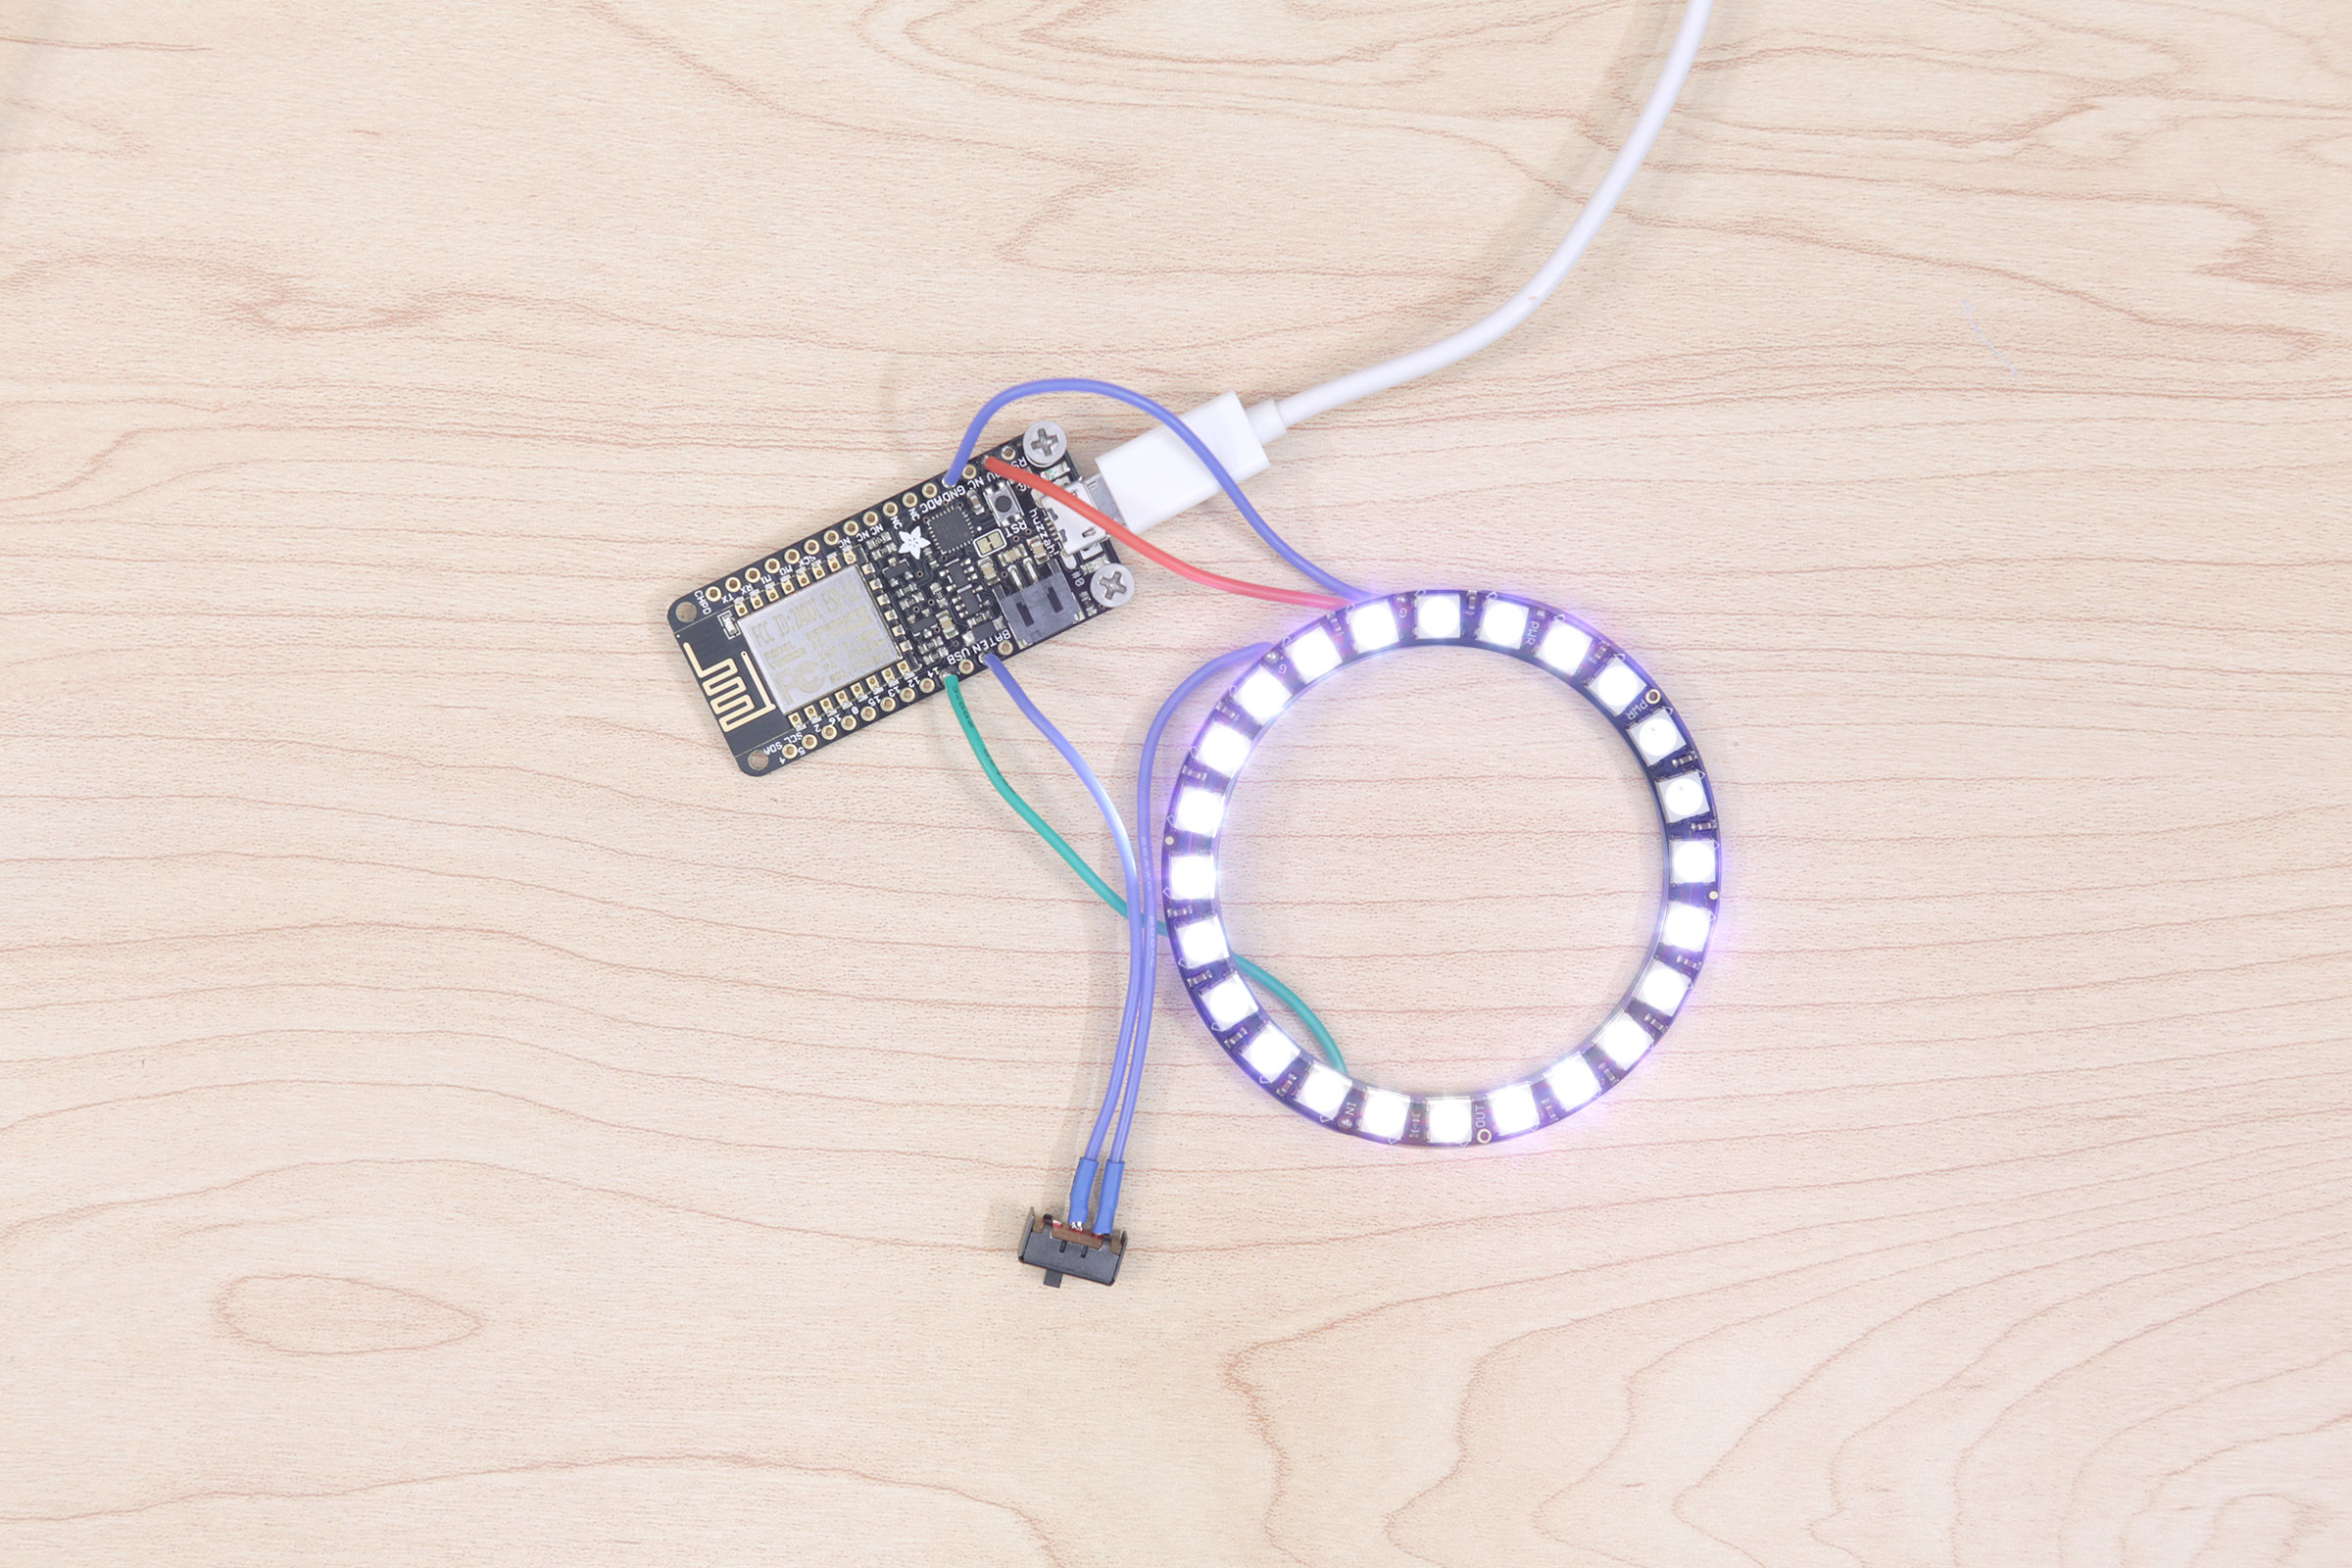 3d_printing_circuit-test.jpg